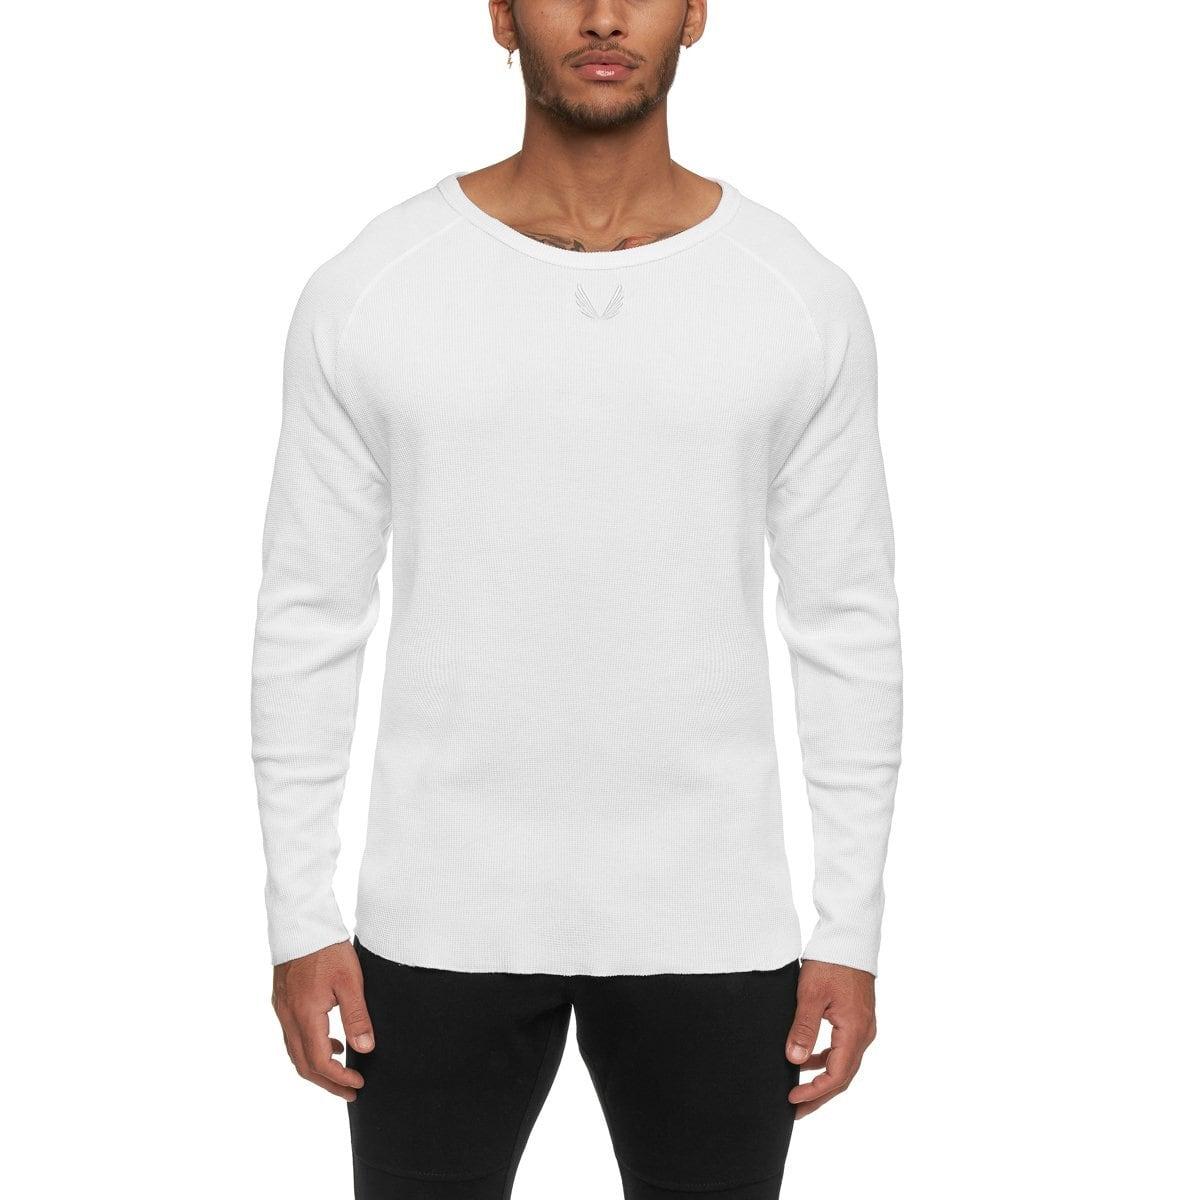 【ASRV】SilverPlus® メッシュバックロングシャツ - White